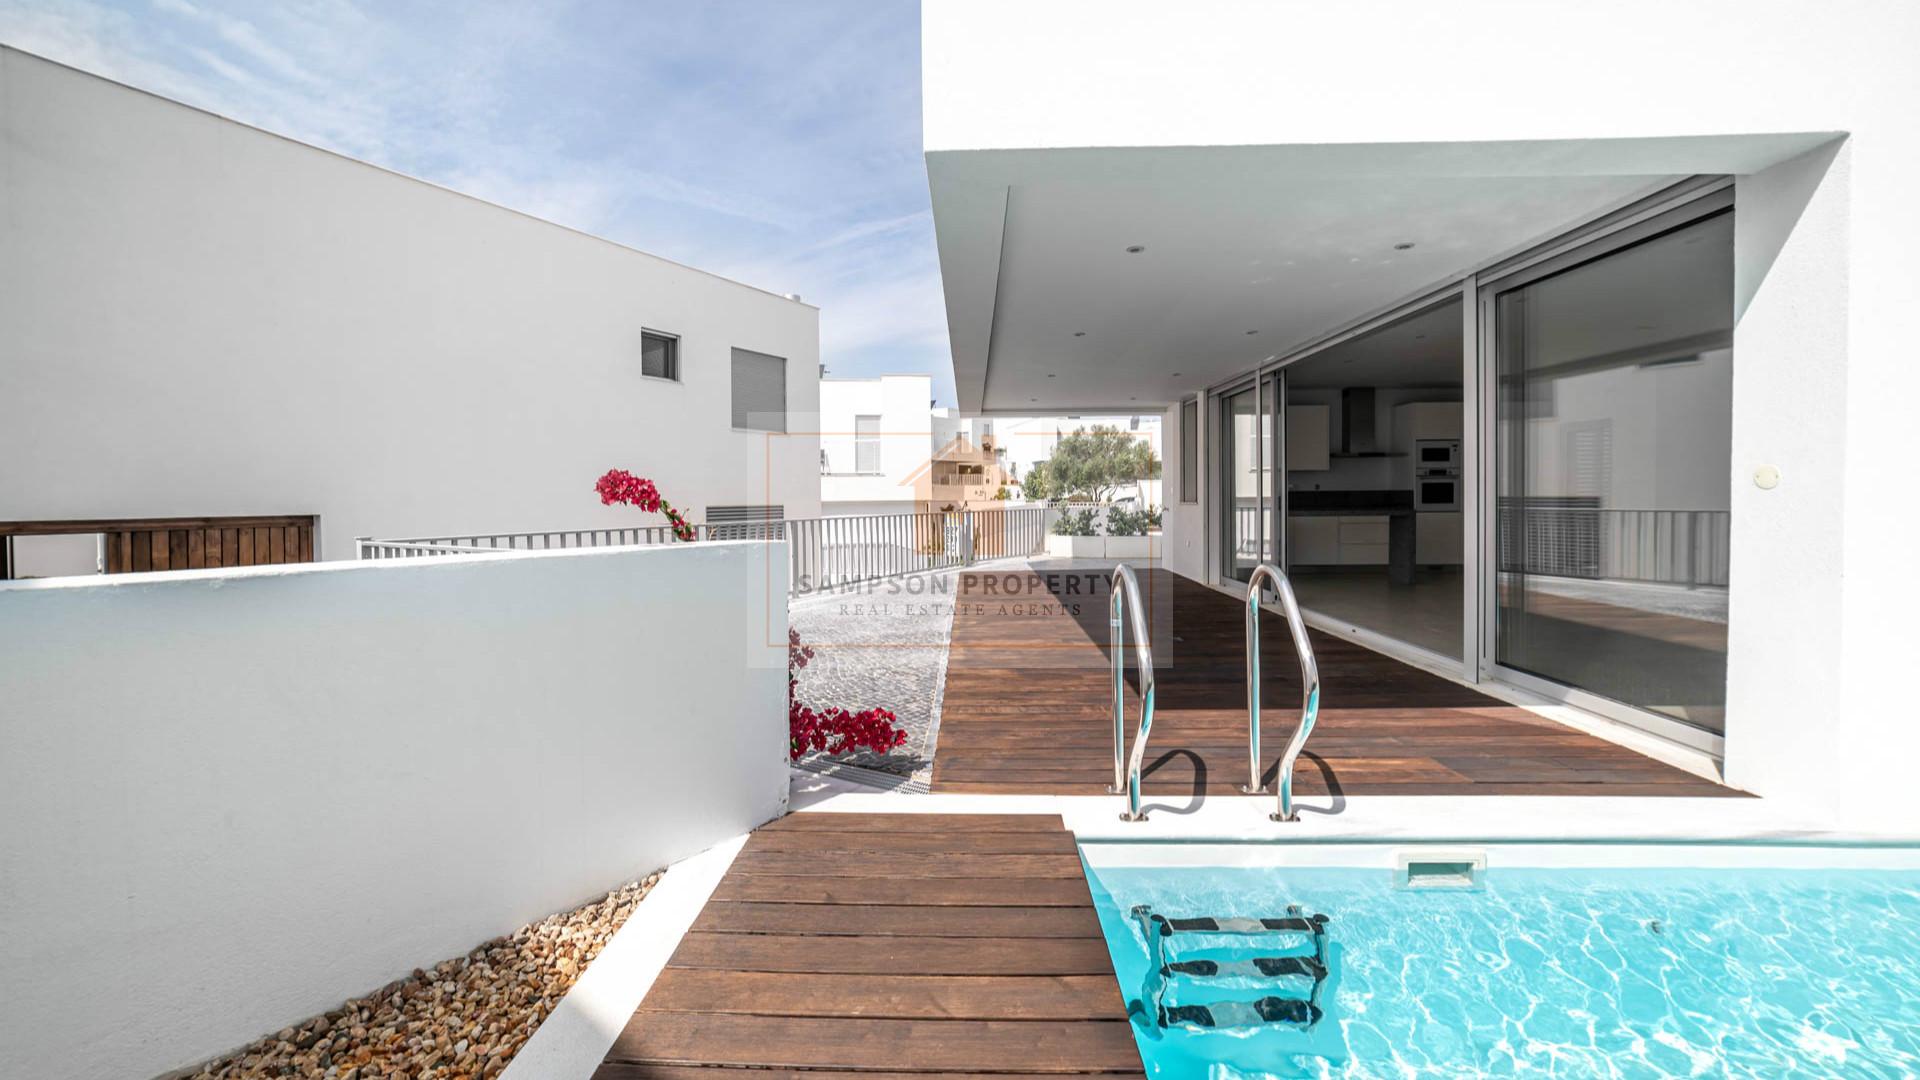 New Build - modern 1+2 bed villa w/heated pool & garage